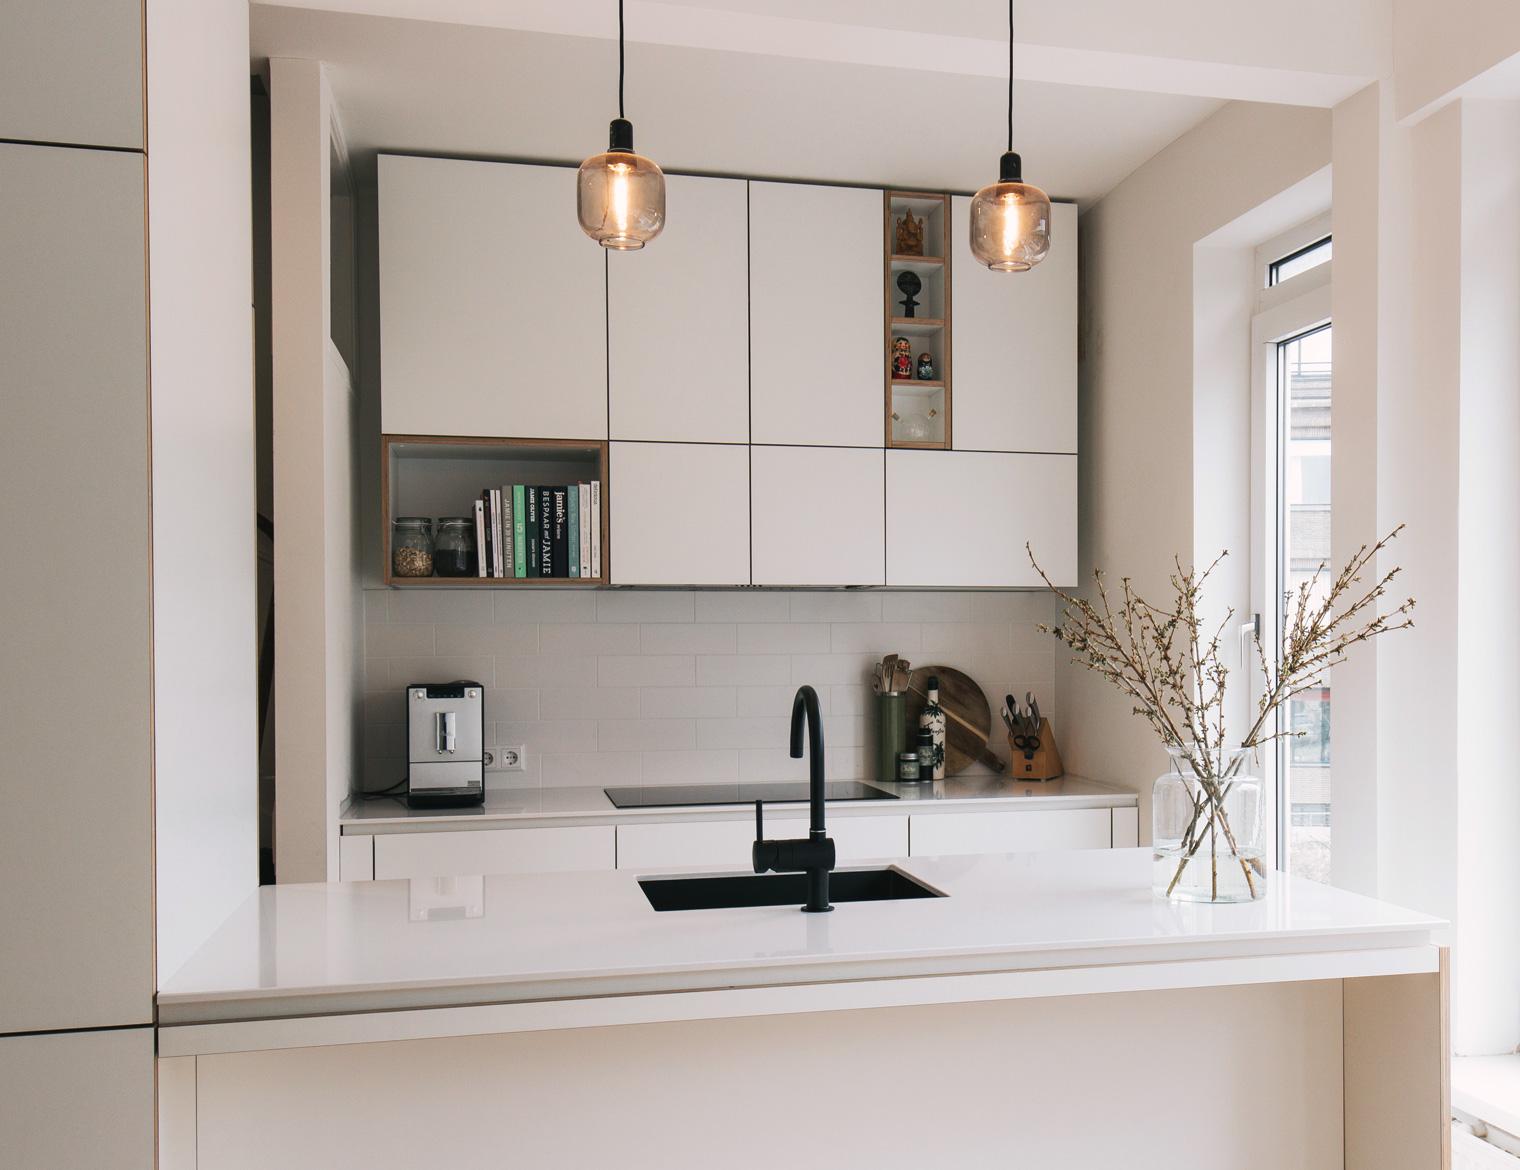 studio Biek - keuken - Rotterdam - interieur architect - Hofbogen